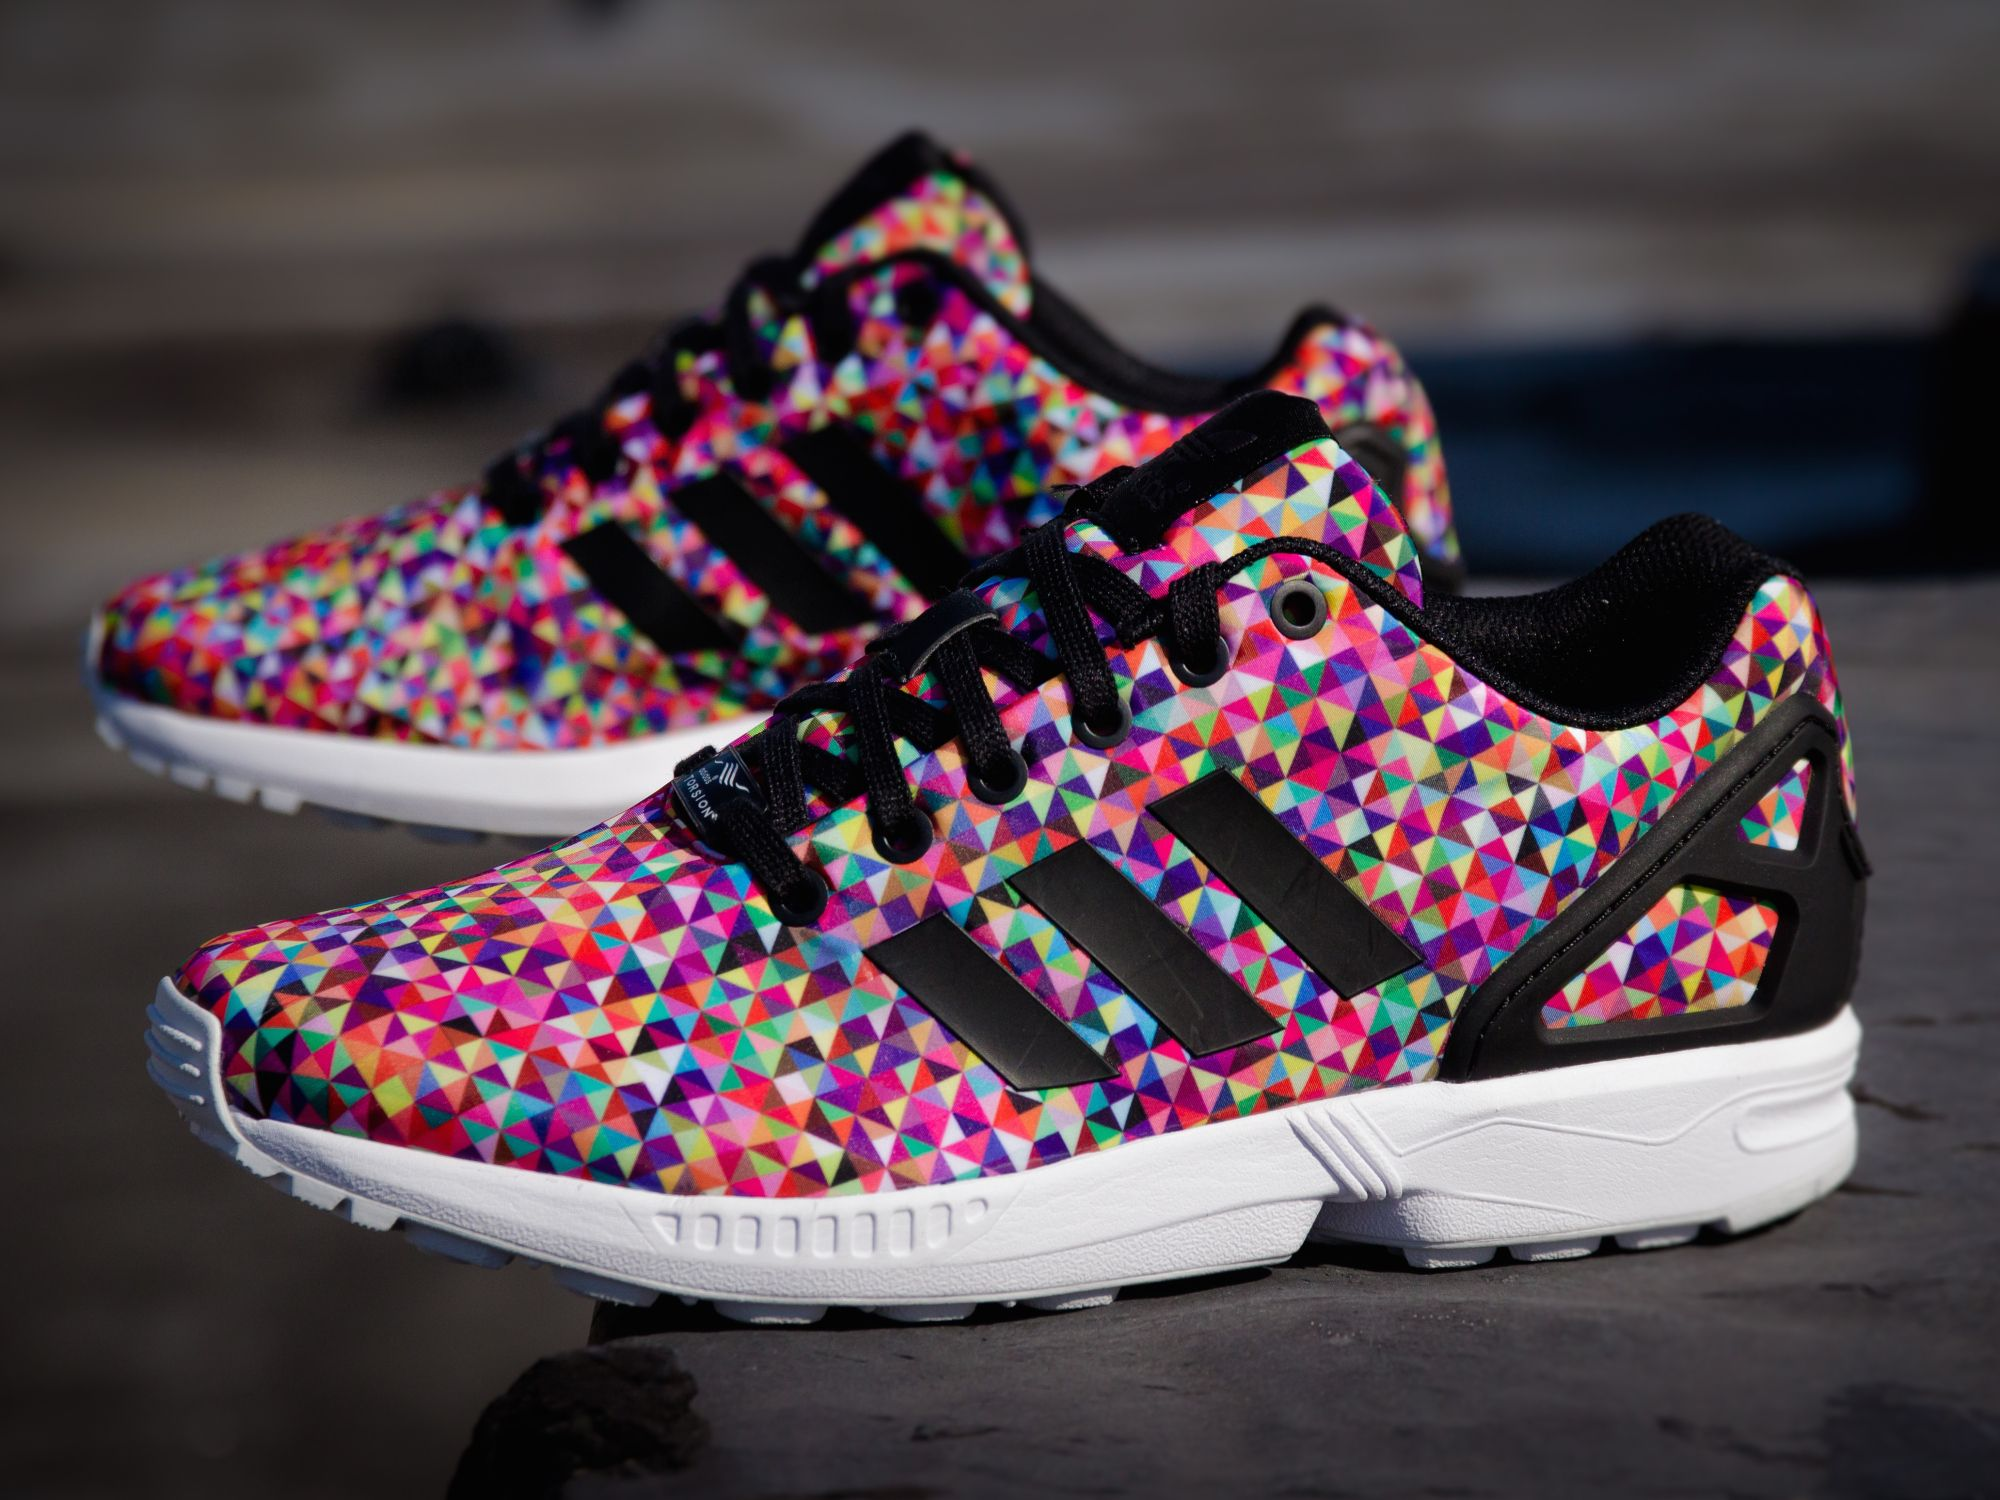 63d08909476f5 Sneaker Review – Adidas ZX Flux